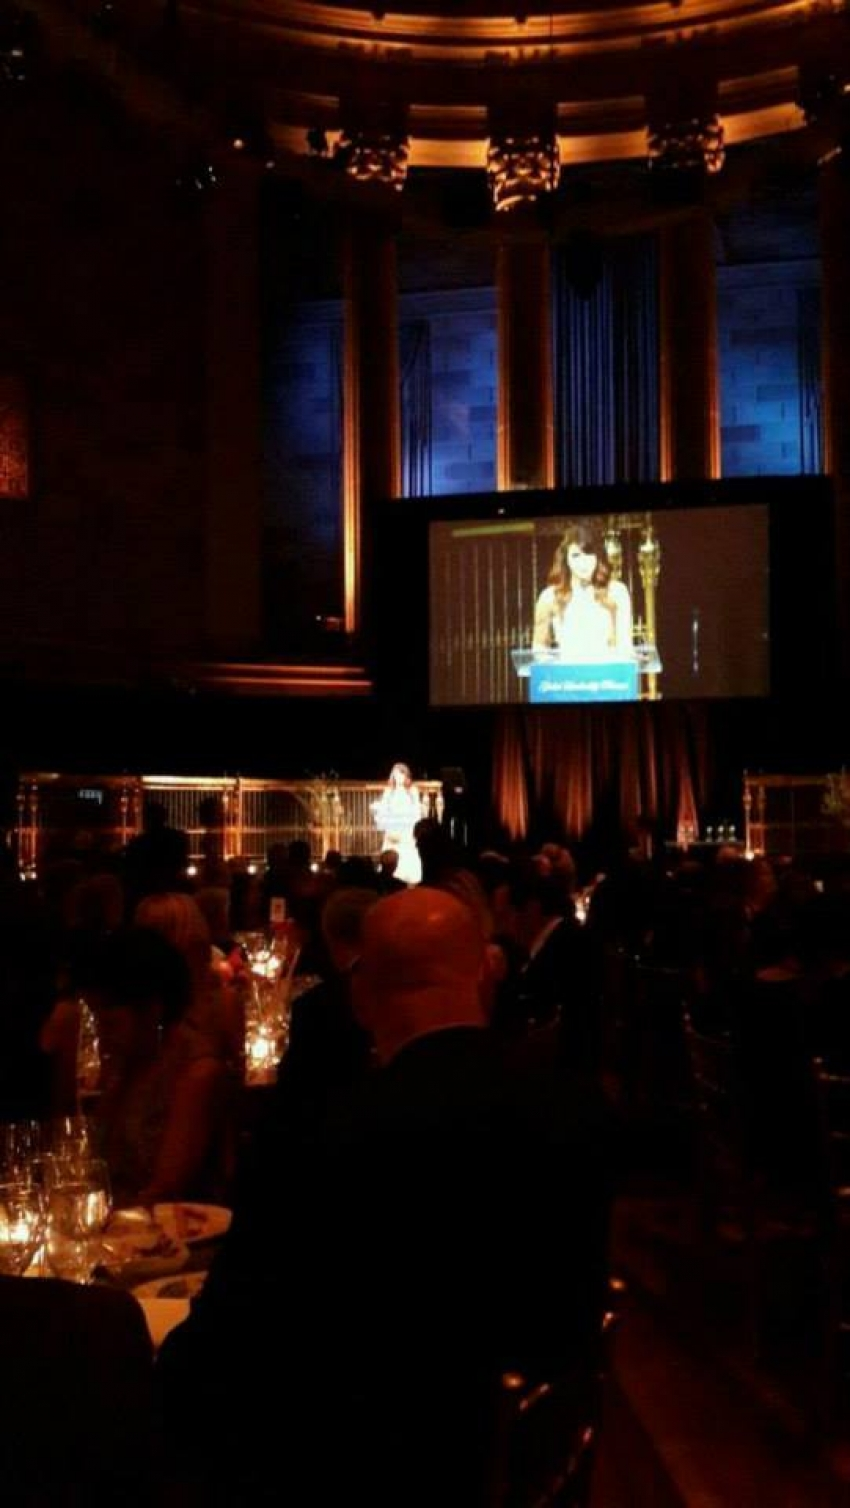 Priyanka Chopra At The United Nations Foundation Global Leadership Dinner Photos